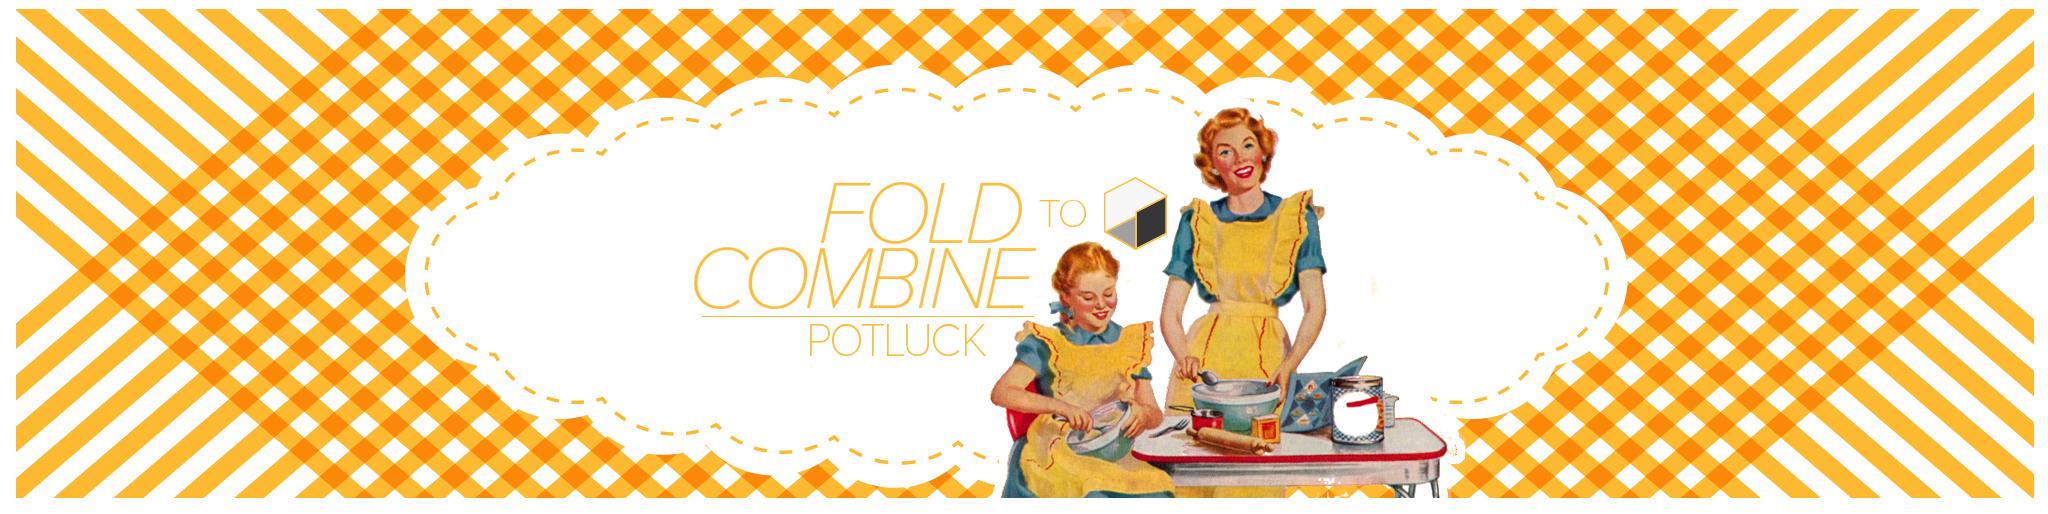 FOLD_2014_foldtocombine__social_layout72__BANNER.png